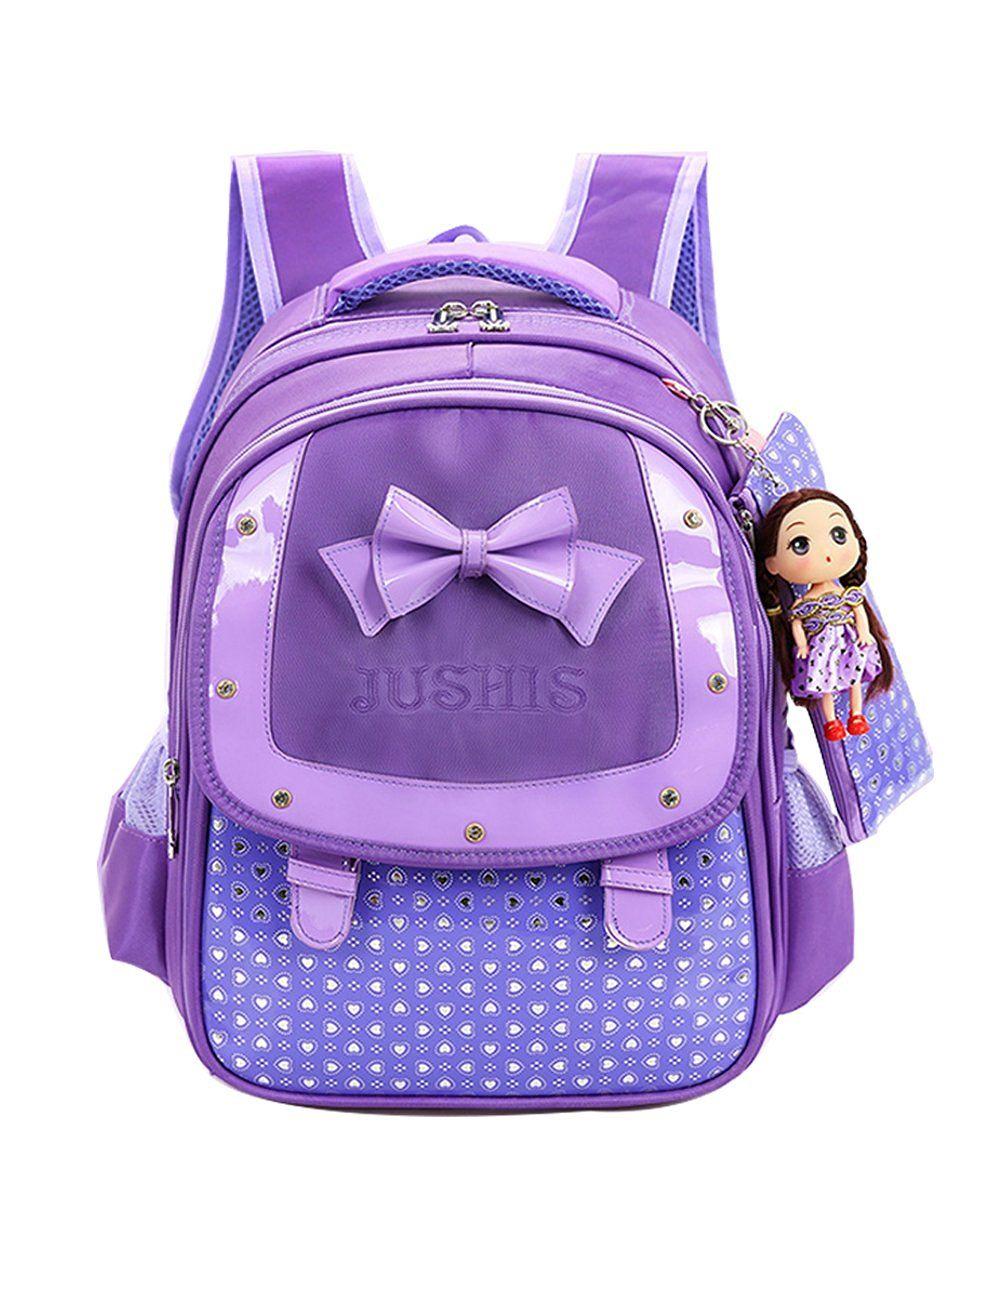 Cute Elementary School Kids Backpack for Girls 1~4 grade 0d40aff63963a